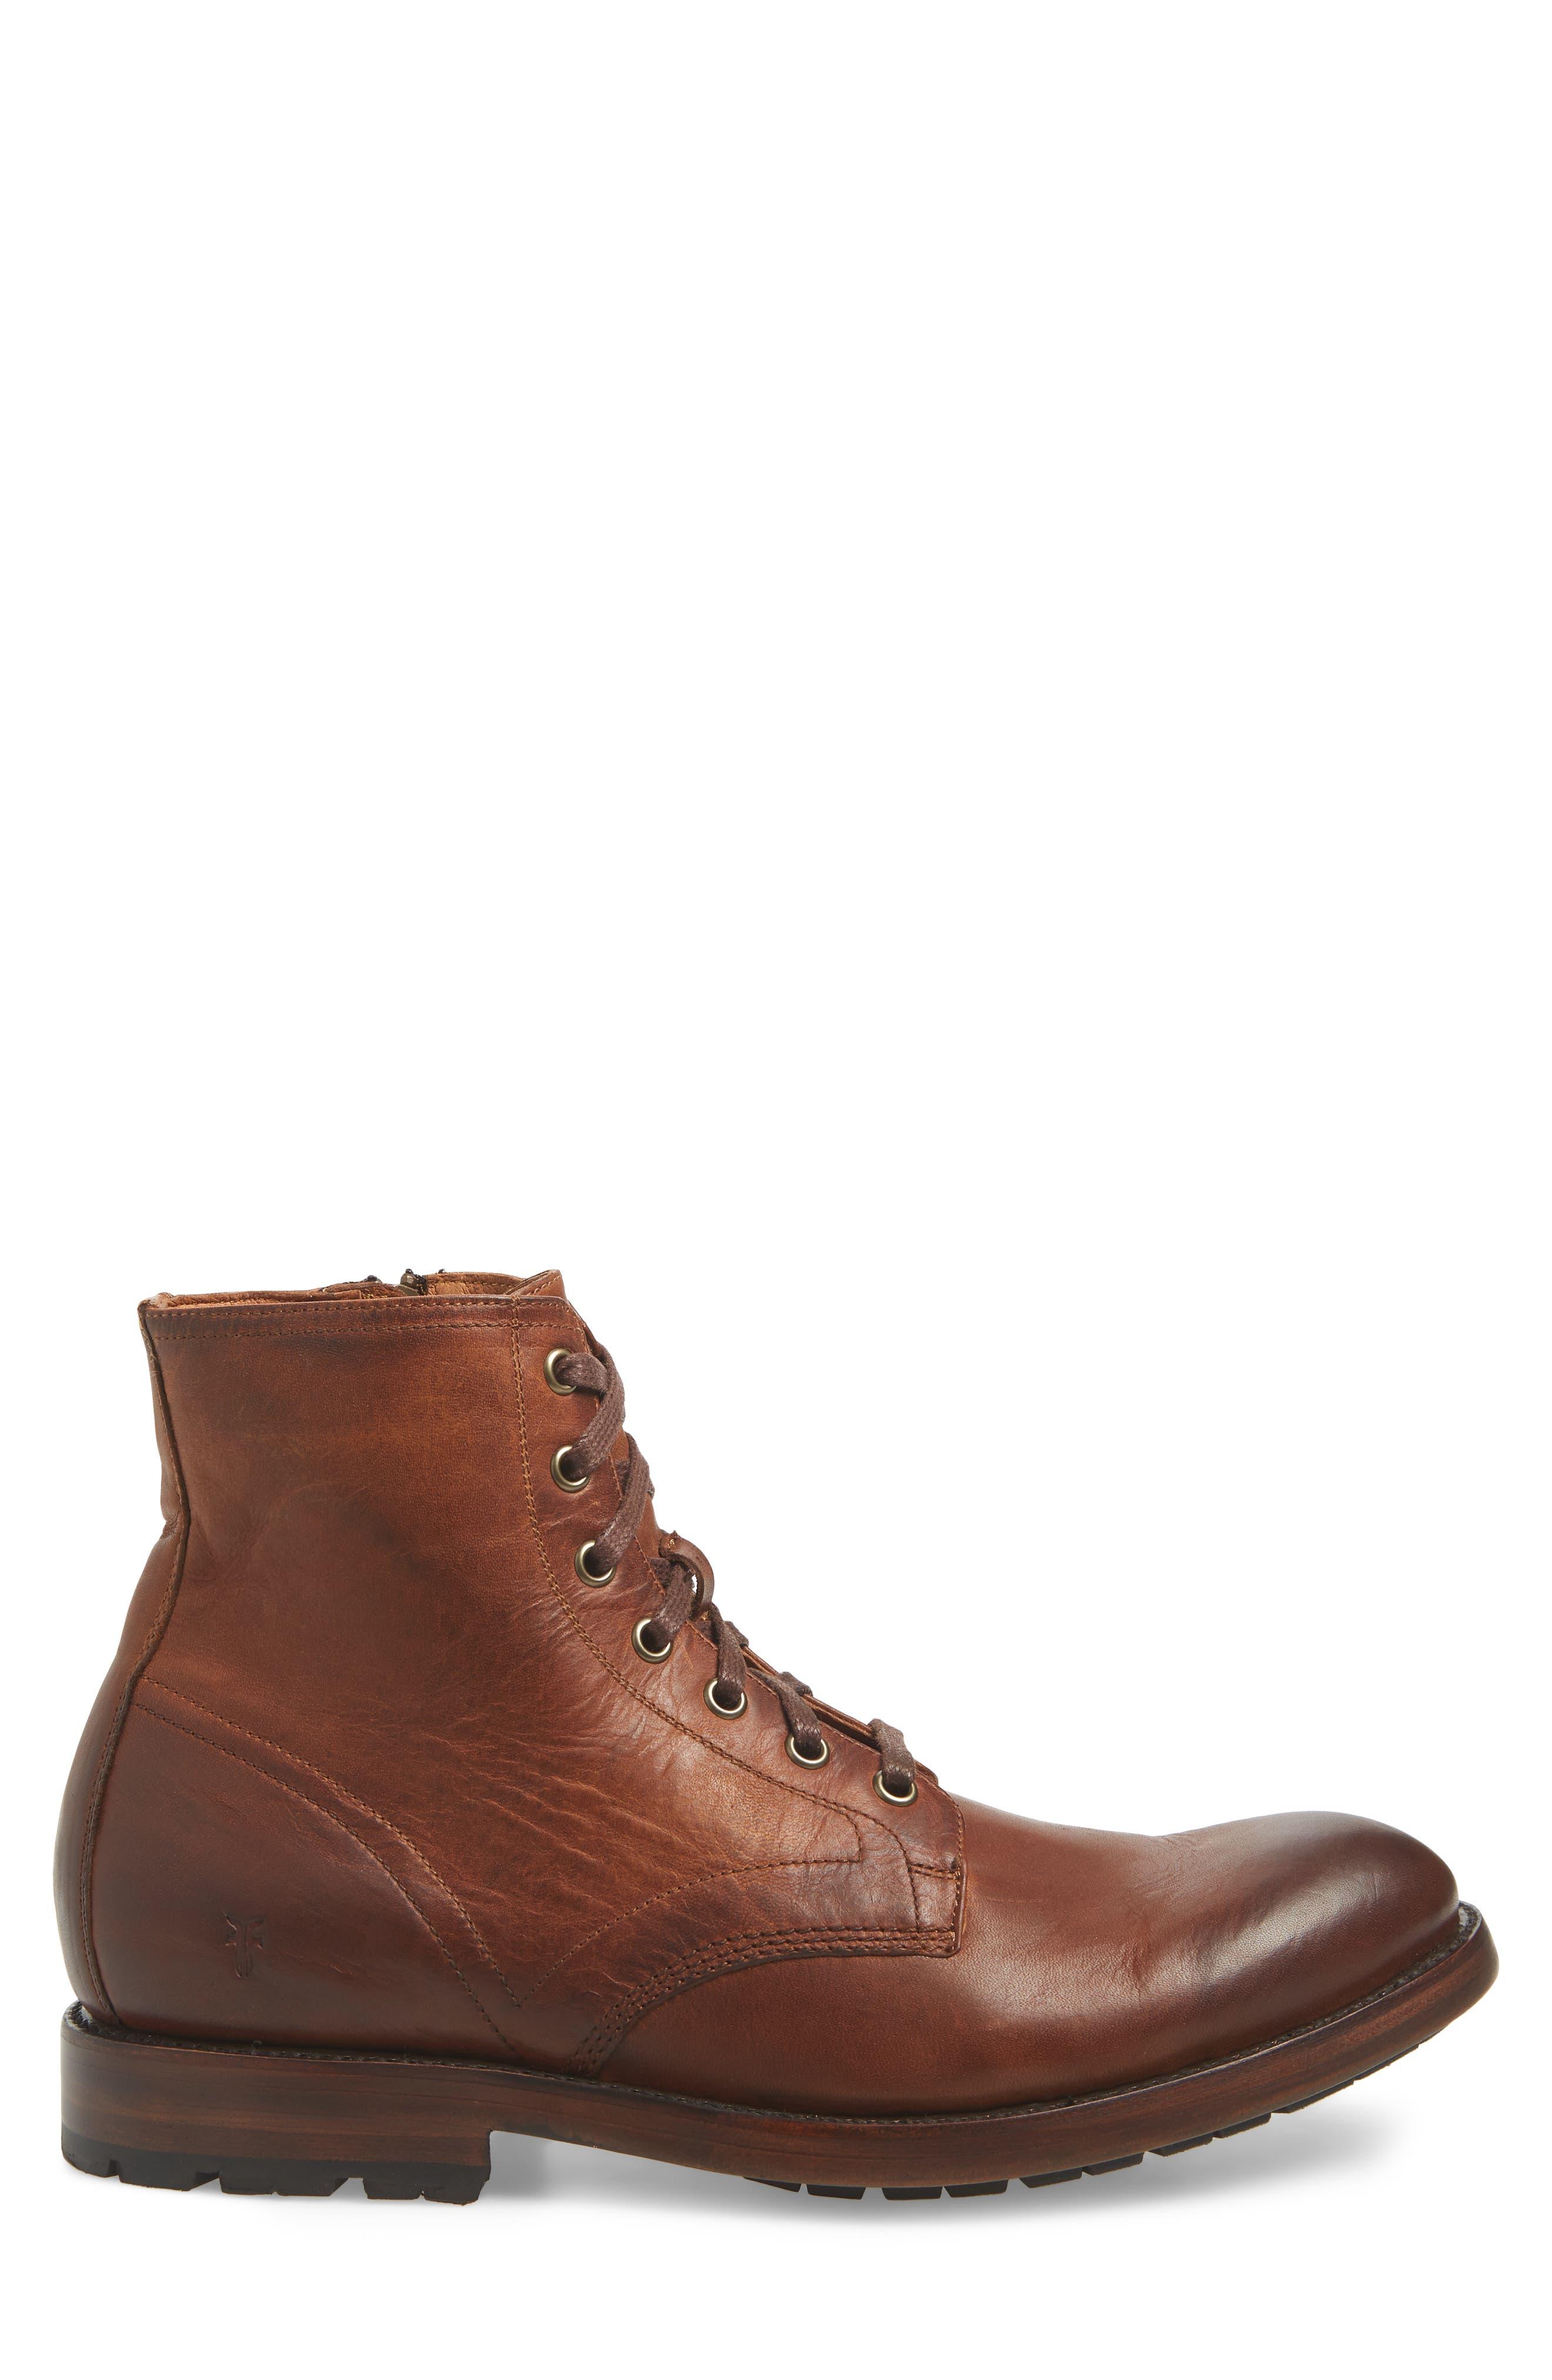 Bowery Plain Toe Boot,                             Alternate thumbnail 3, color,                             COGNAC